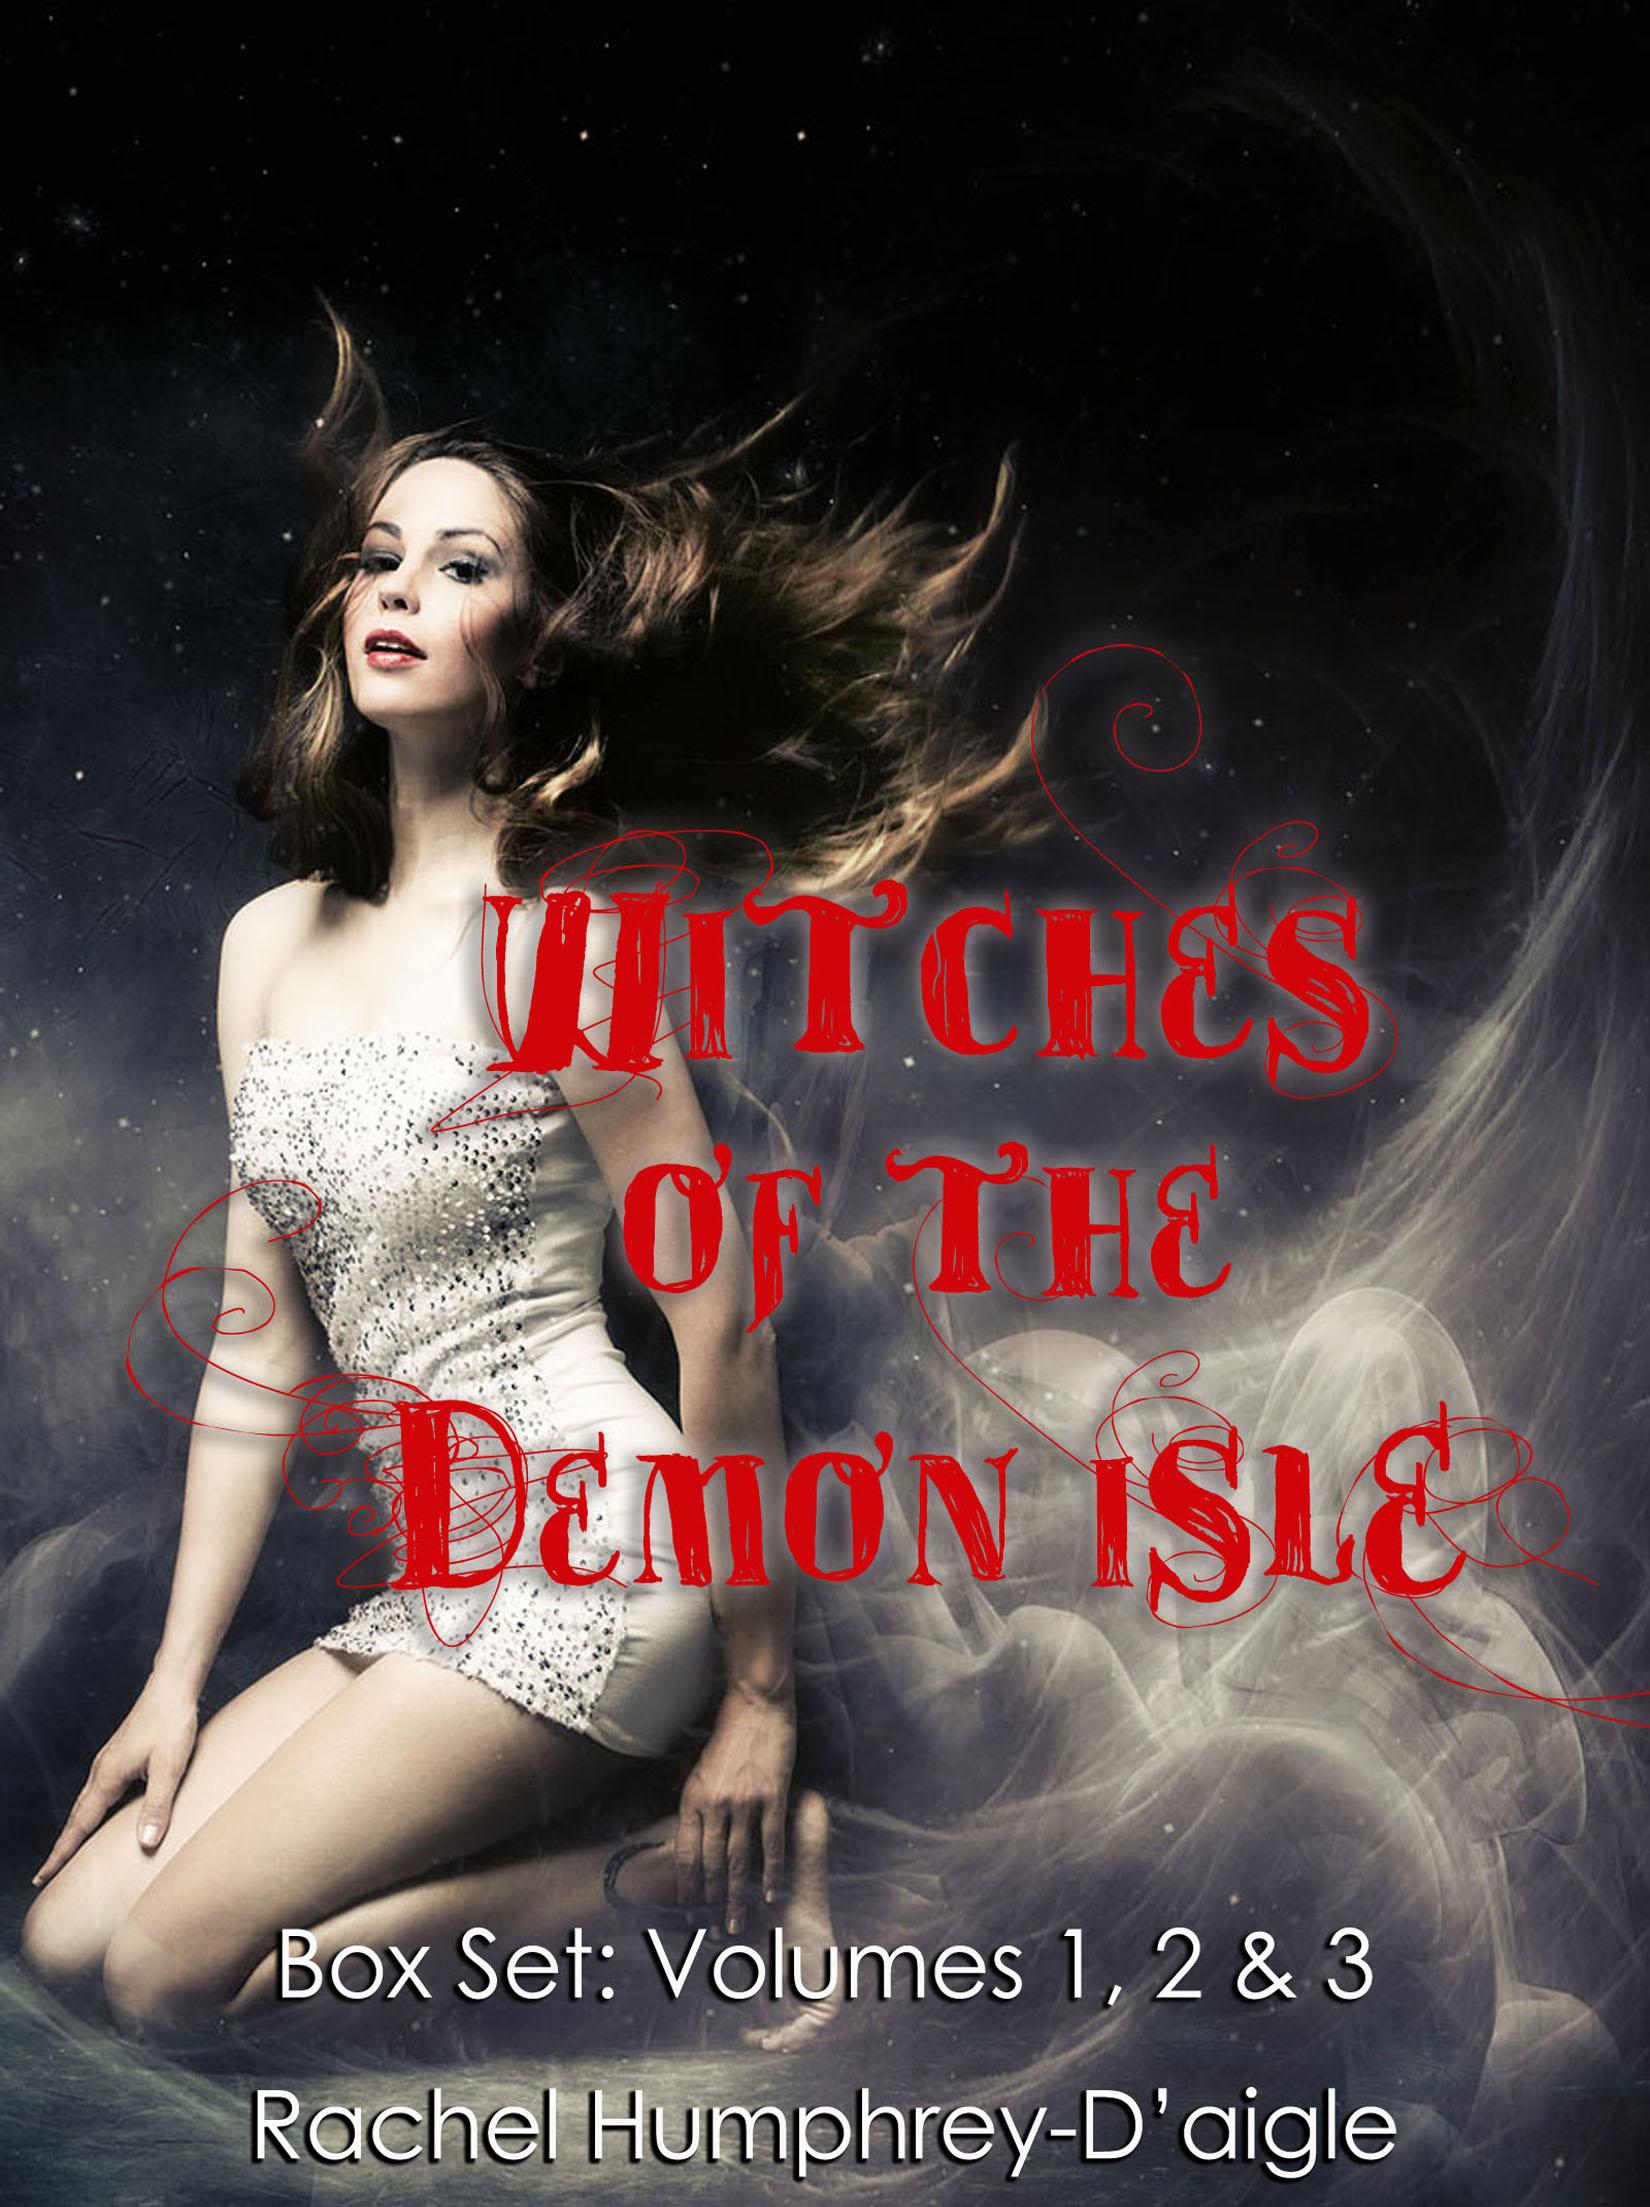 Rachel Humphrey Daigle - Witches of The Demon Isle Box Set, Volumes 1, 2 & 3